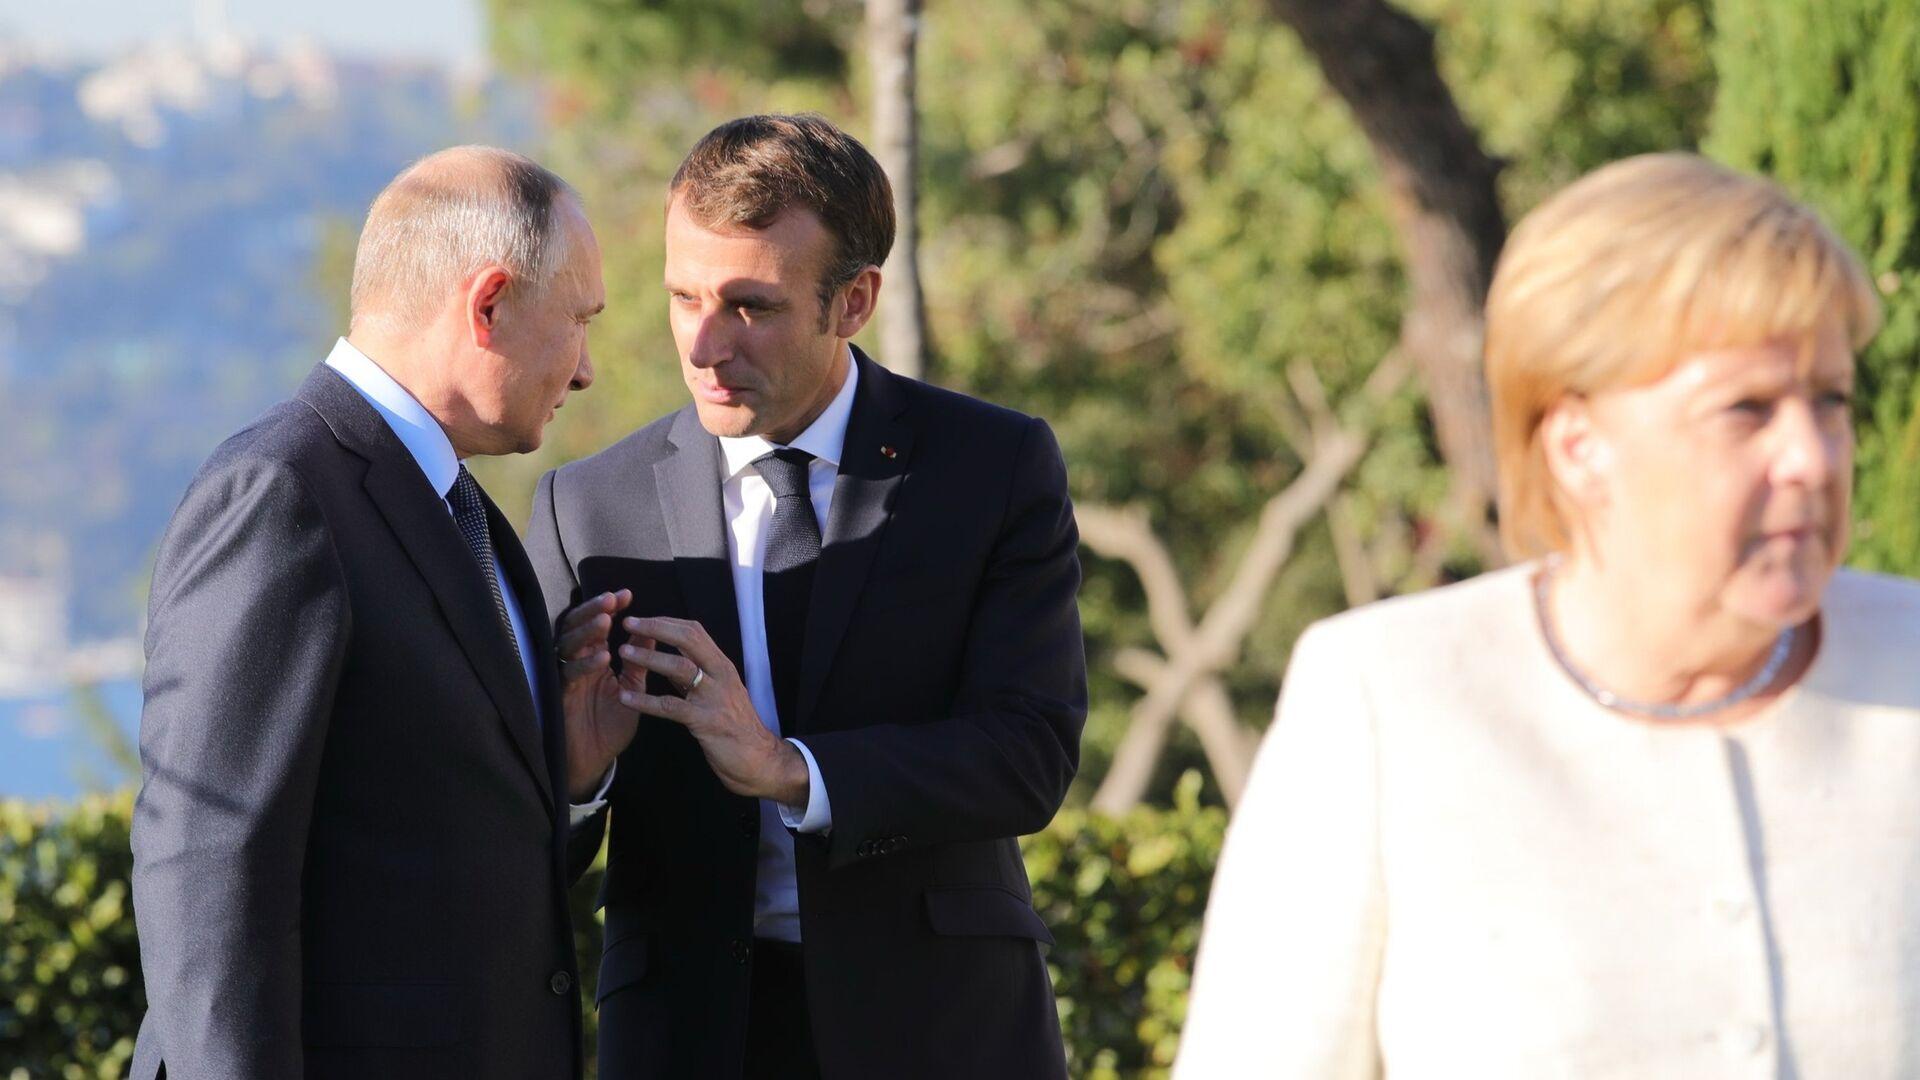 Ottobre 27, 2018, L'incontro sulla Siria tra Vladimir Putin, Emmanuel Macron, Angela Merkel e Recep Tayyip Erdogan - Sputnik Italia, 1920, 27.06.2021